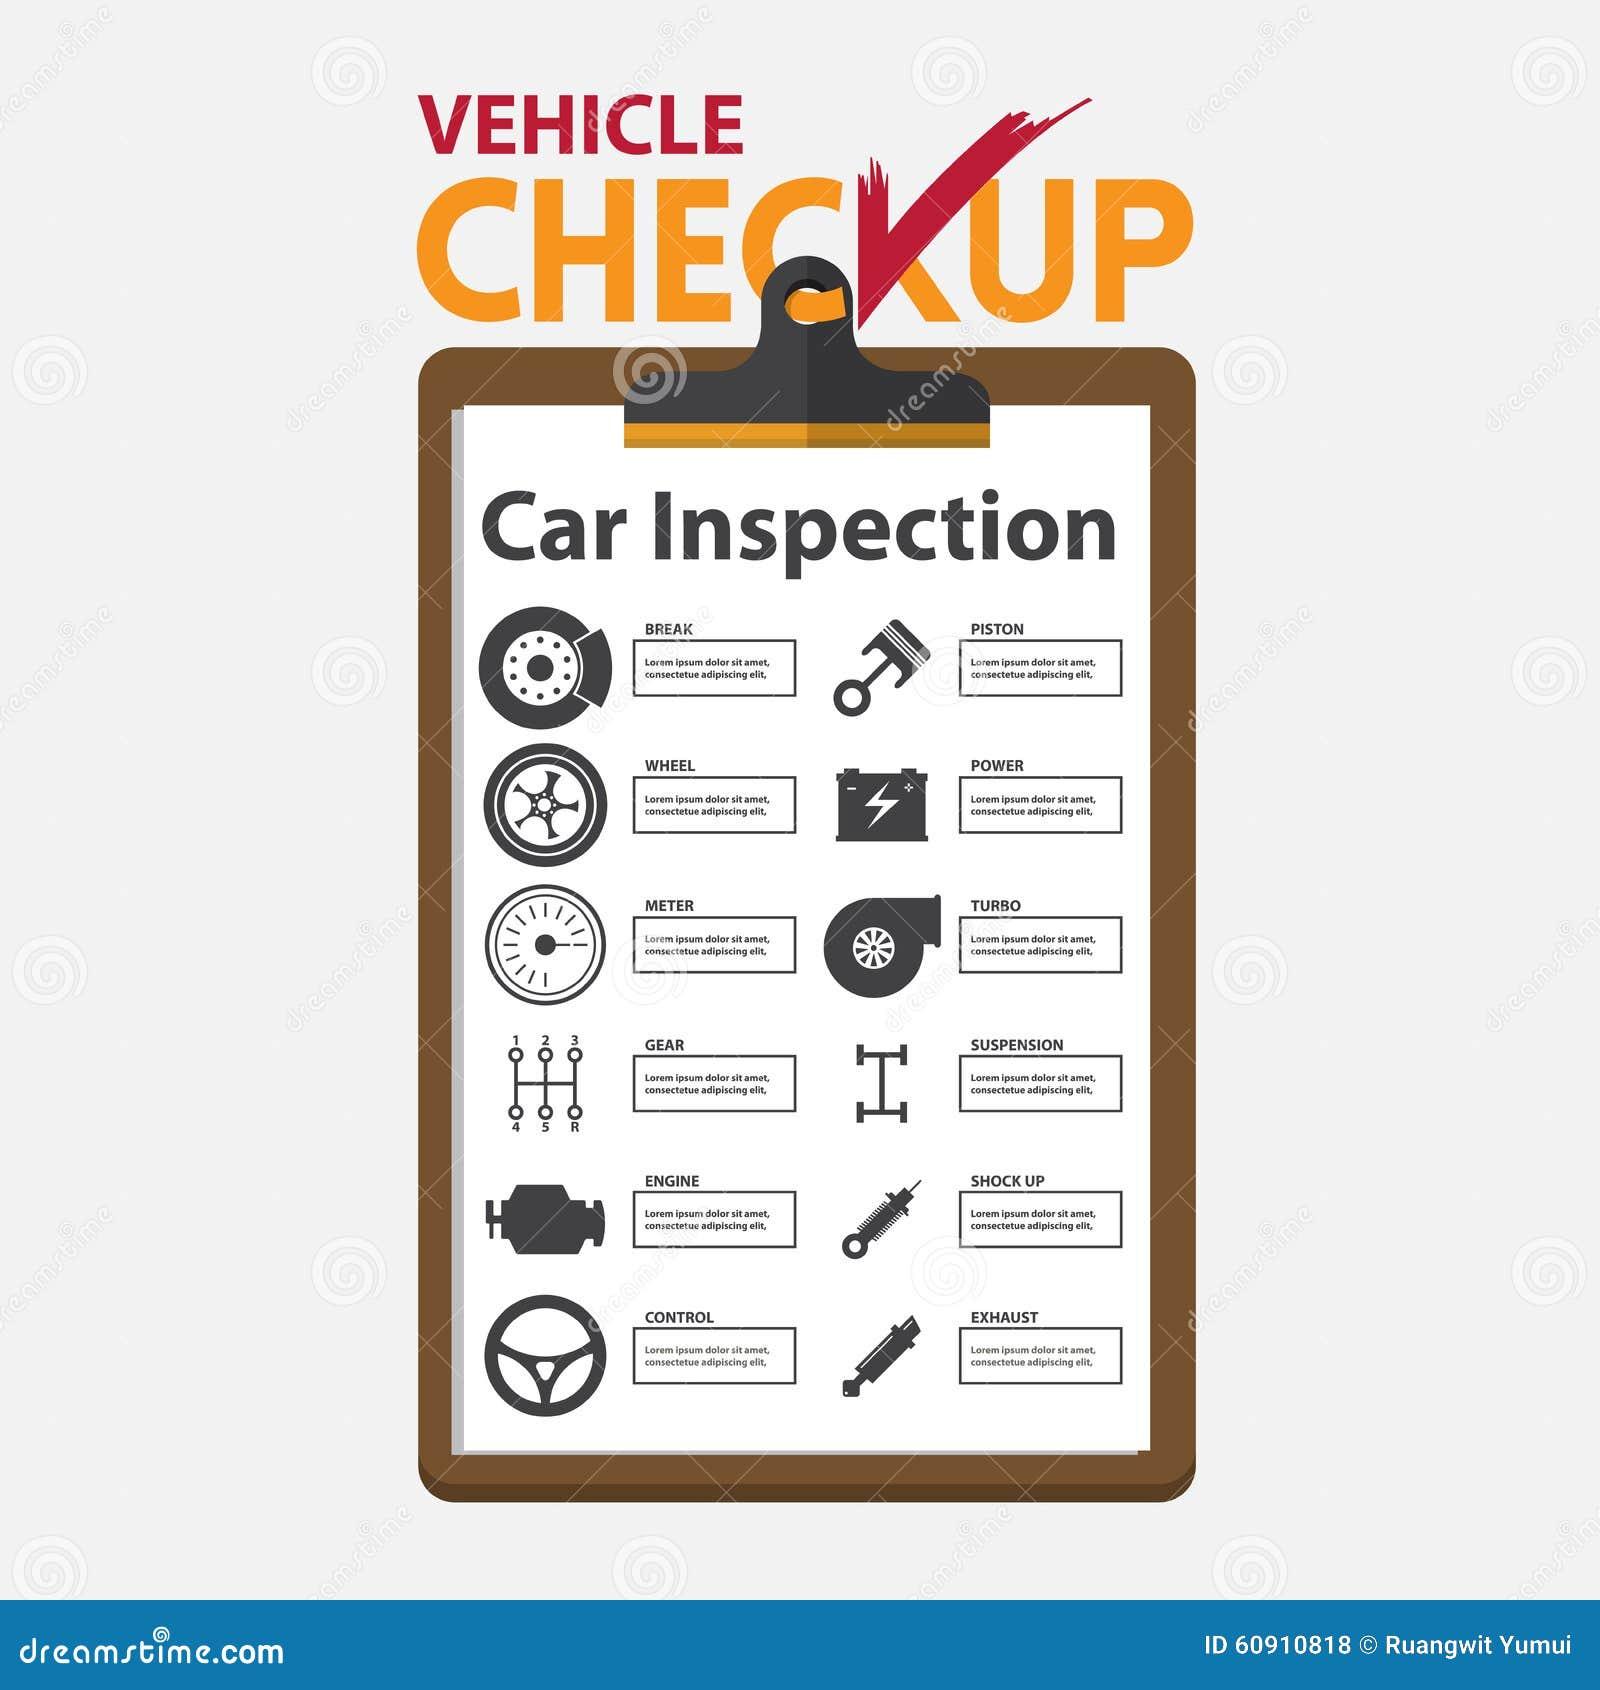 Auto Maintenance Checklist >> Car Repair Infographic In Flat Design. Checkup Clipboard. Stock Vector - Image: 60910818